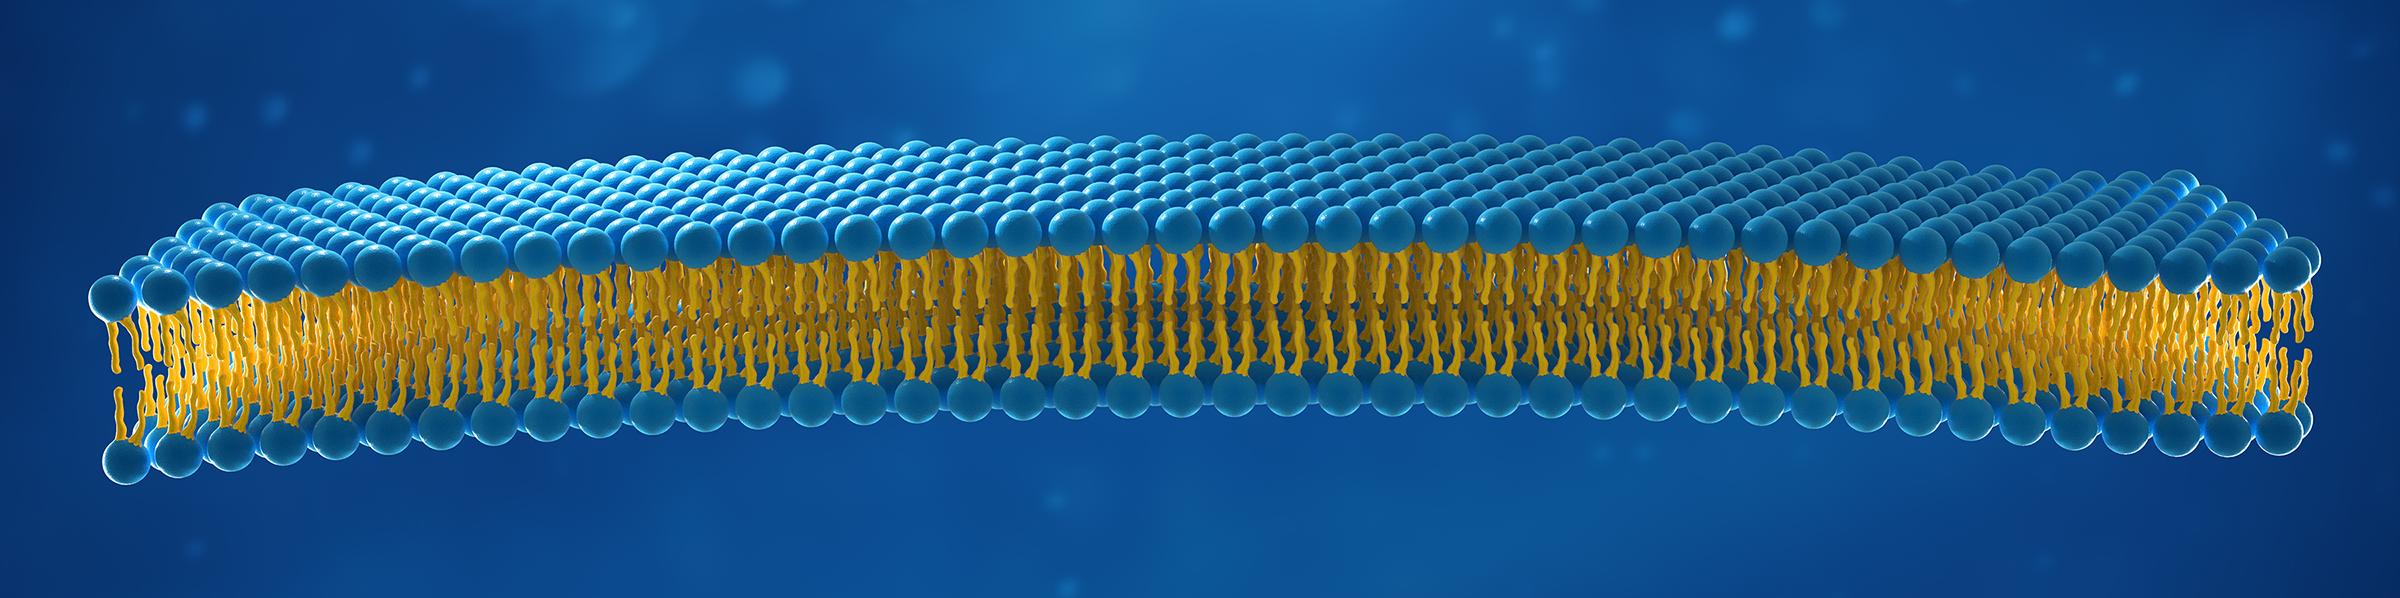 lipid bilayer image 2